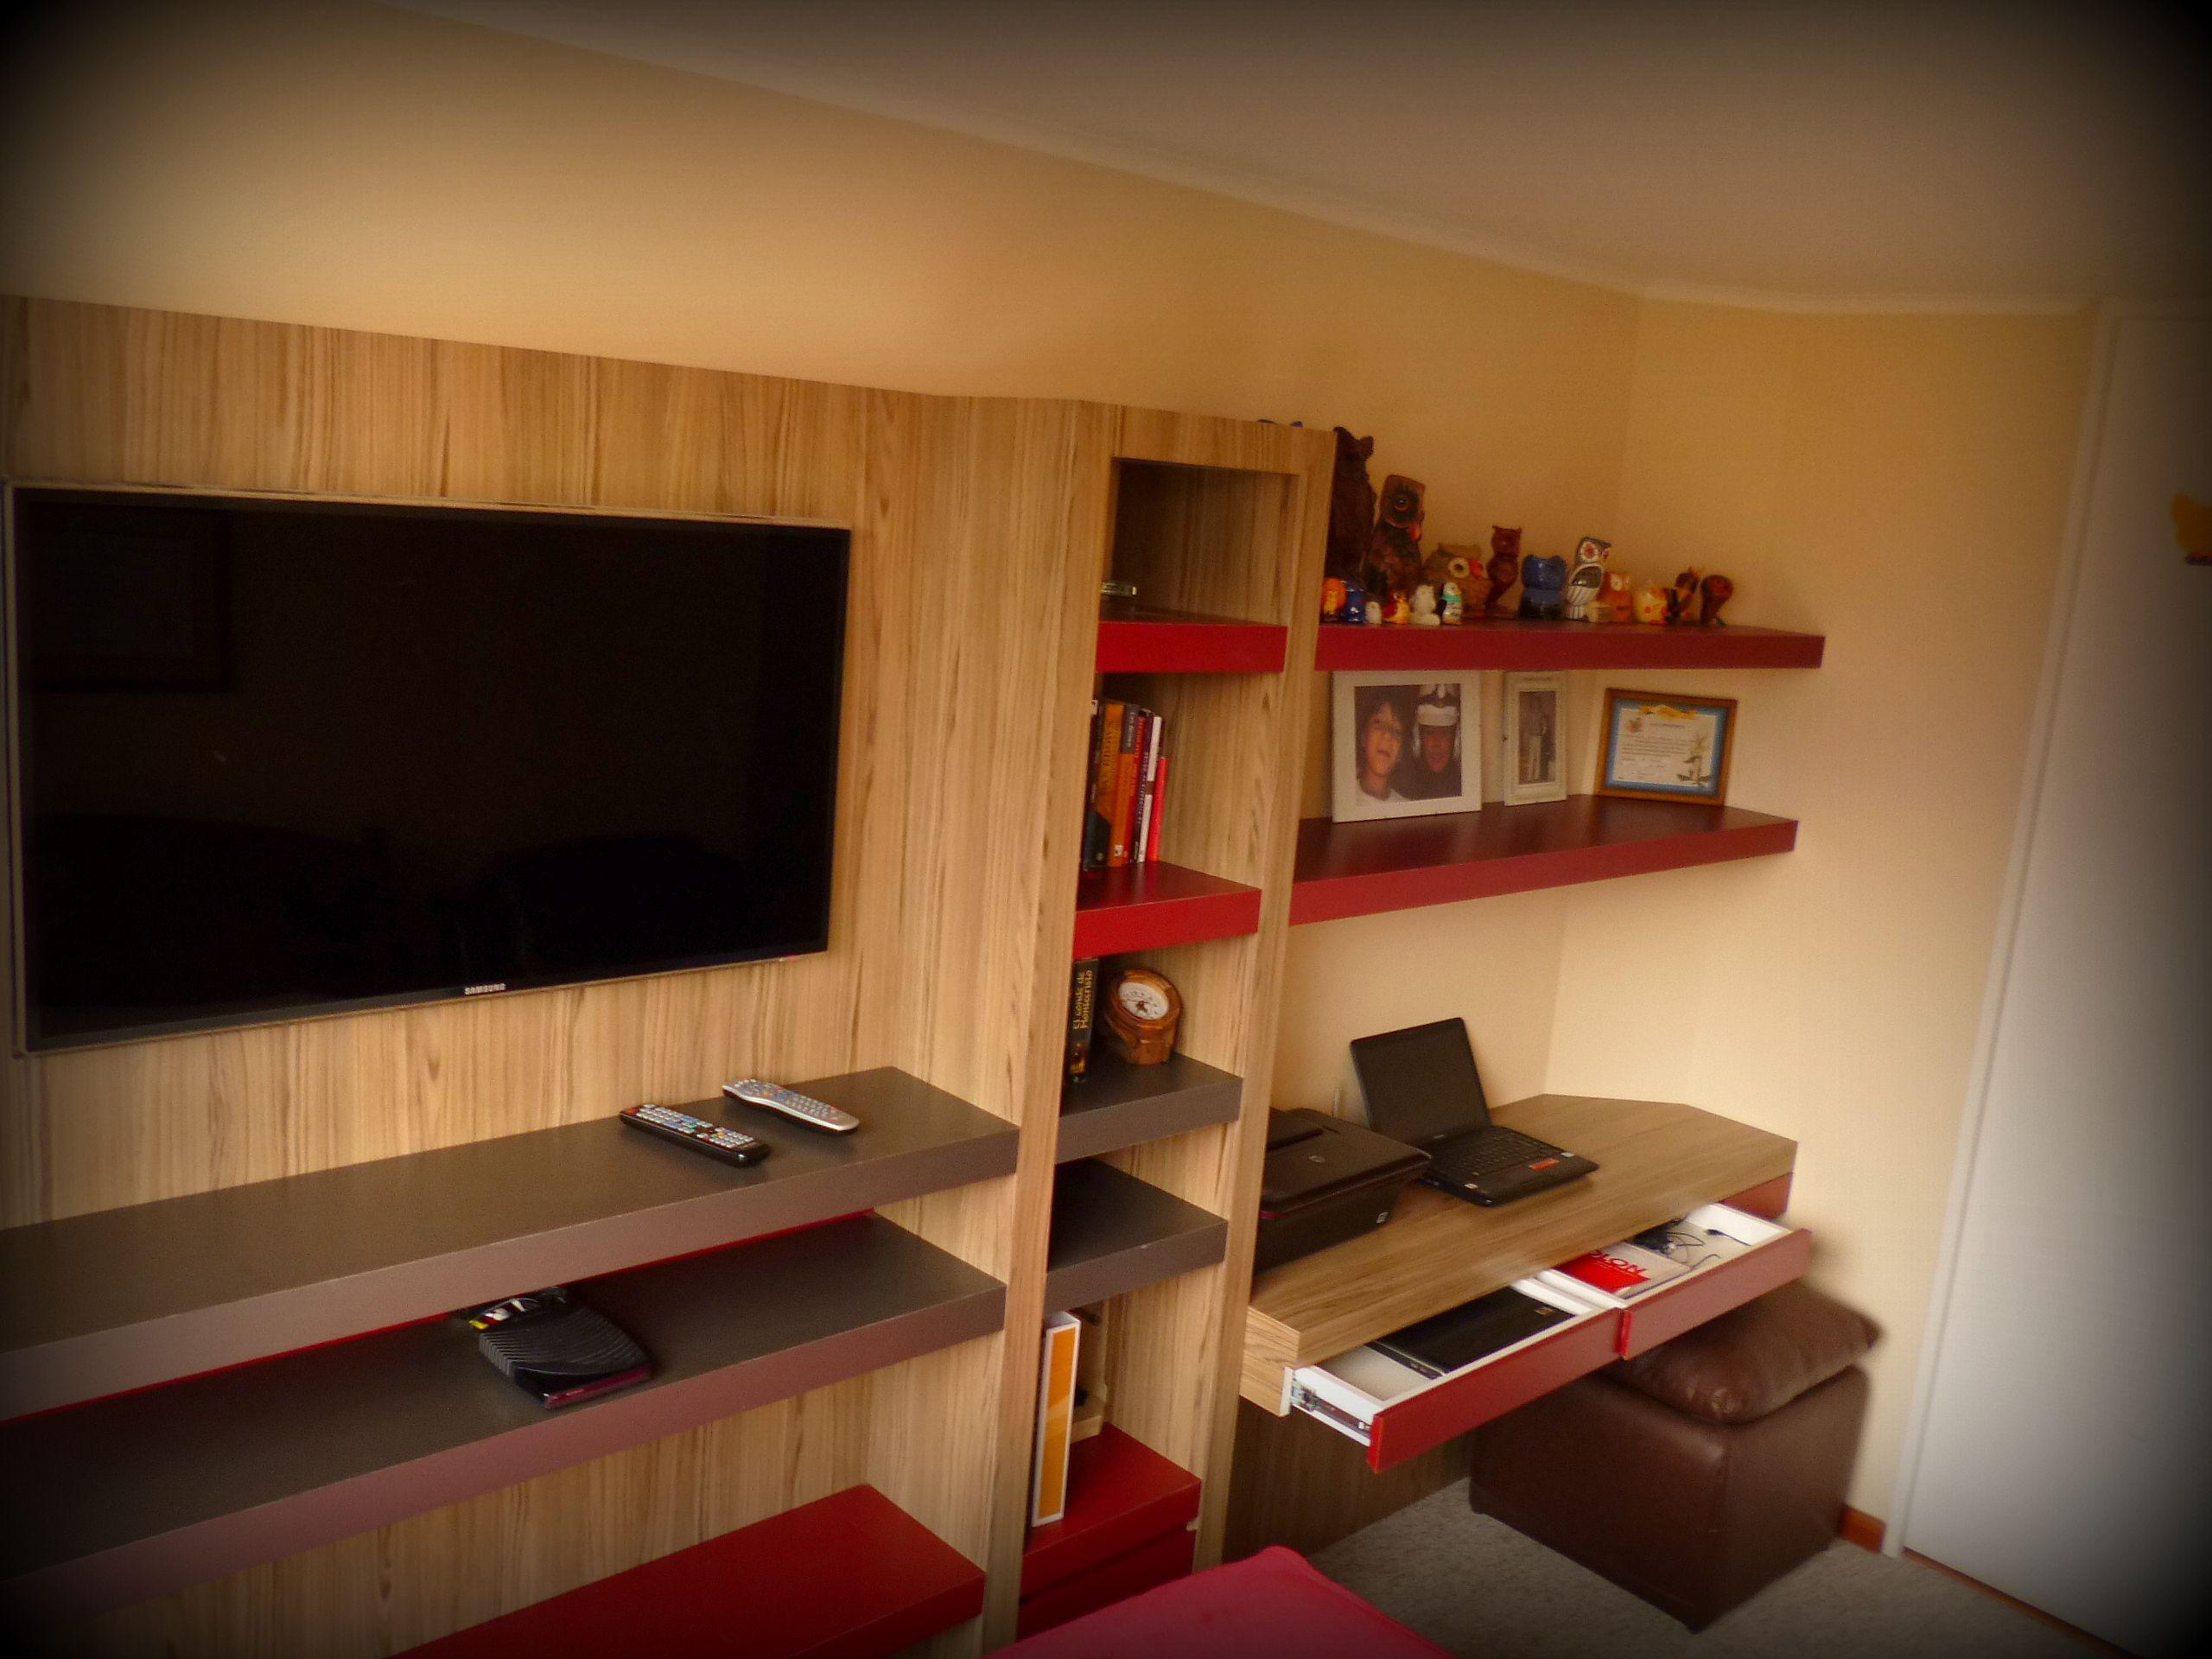 Mueble panel para tv librero con caj n profundo inferior - Libreros de madera modernos ...